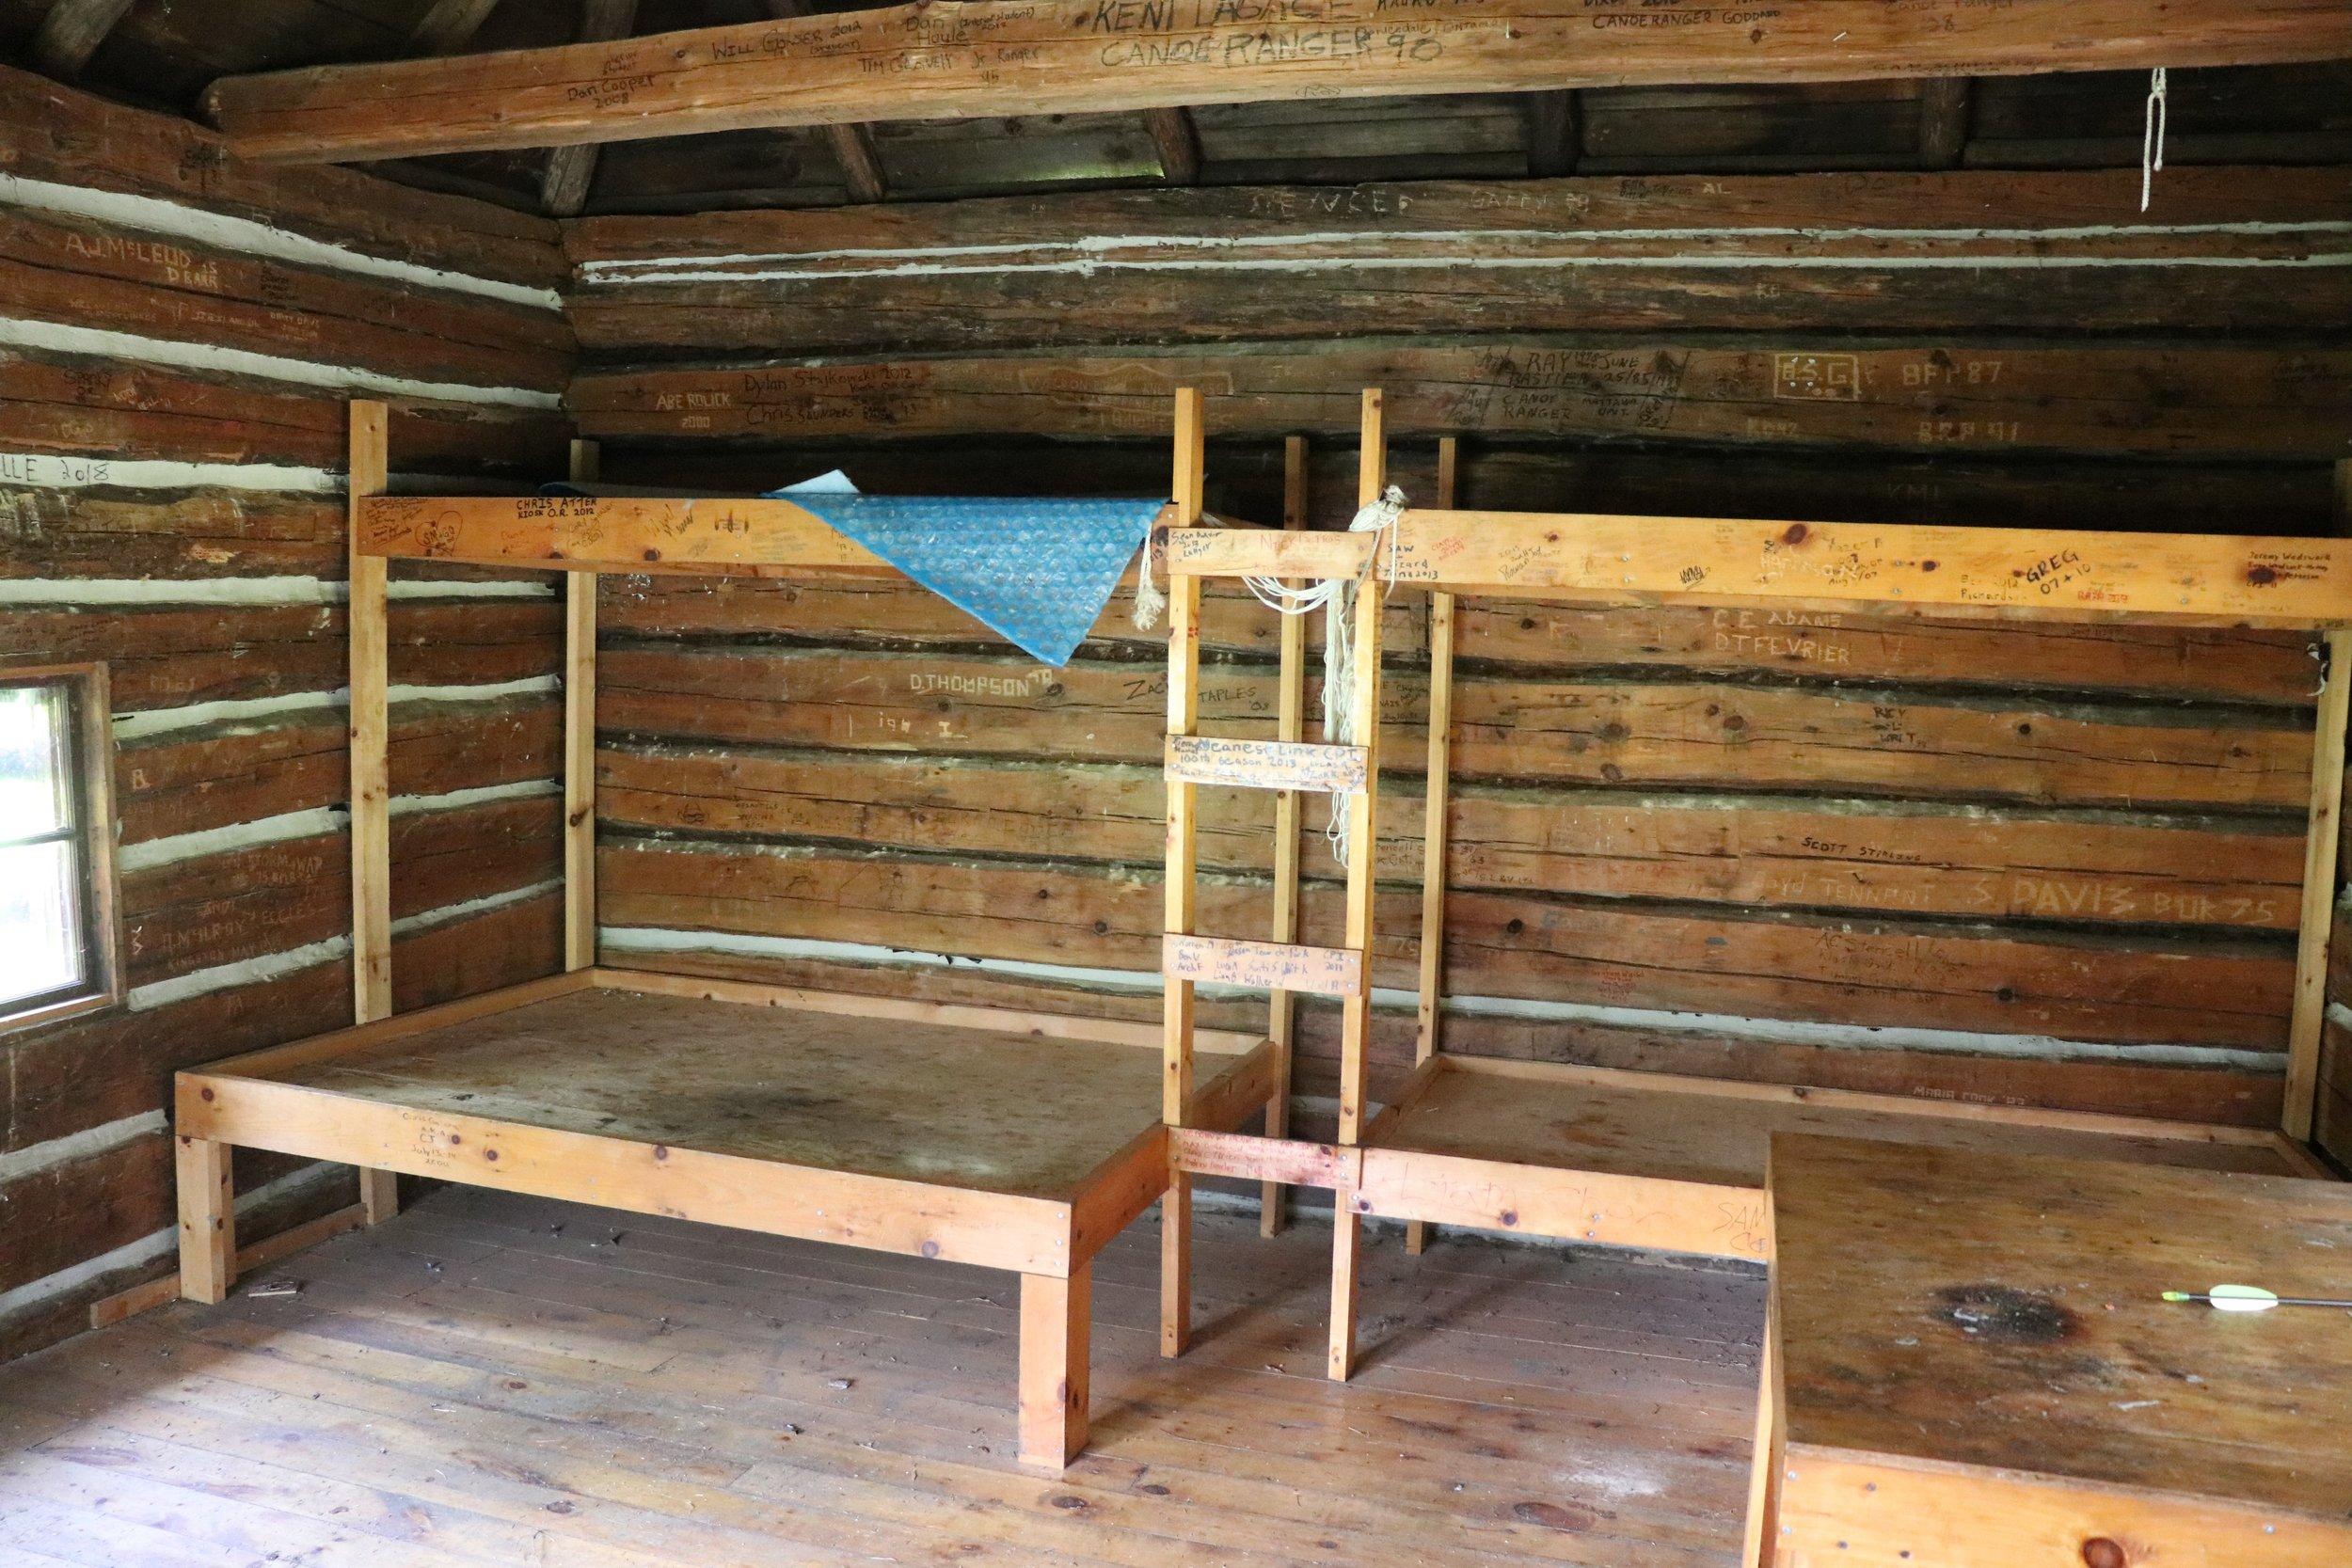 Inside the Highview Ranger Cabin in Algonquin Park